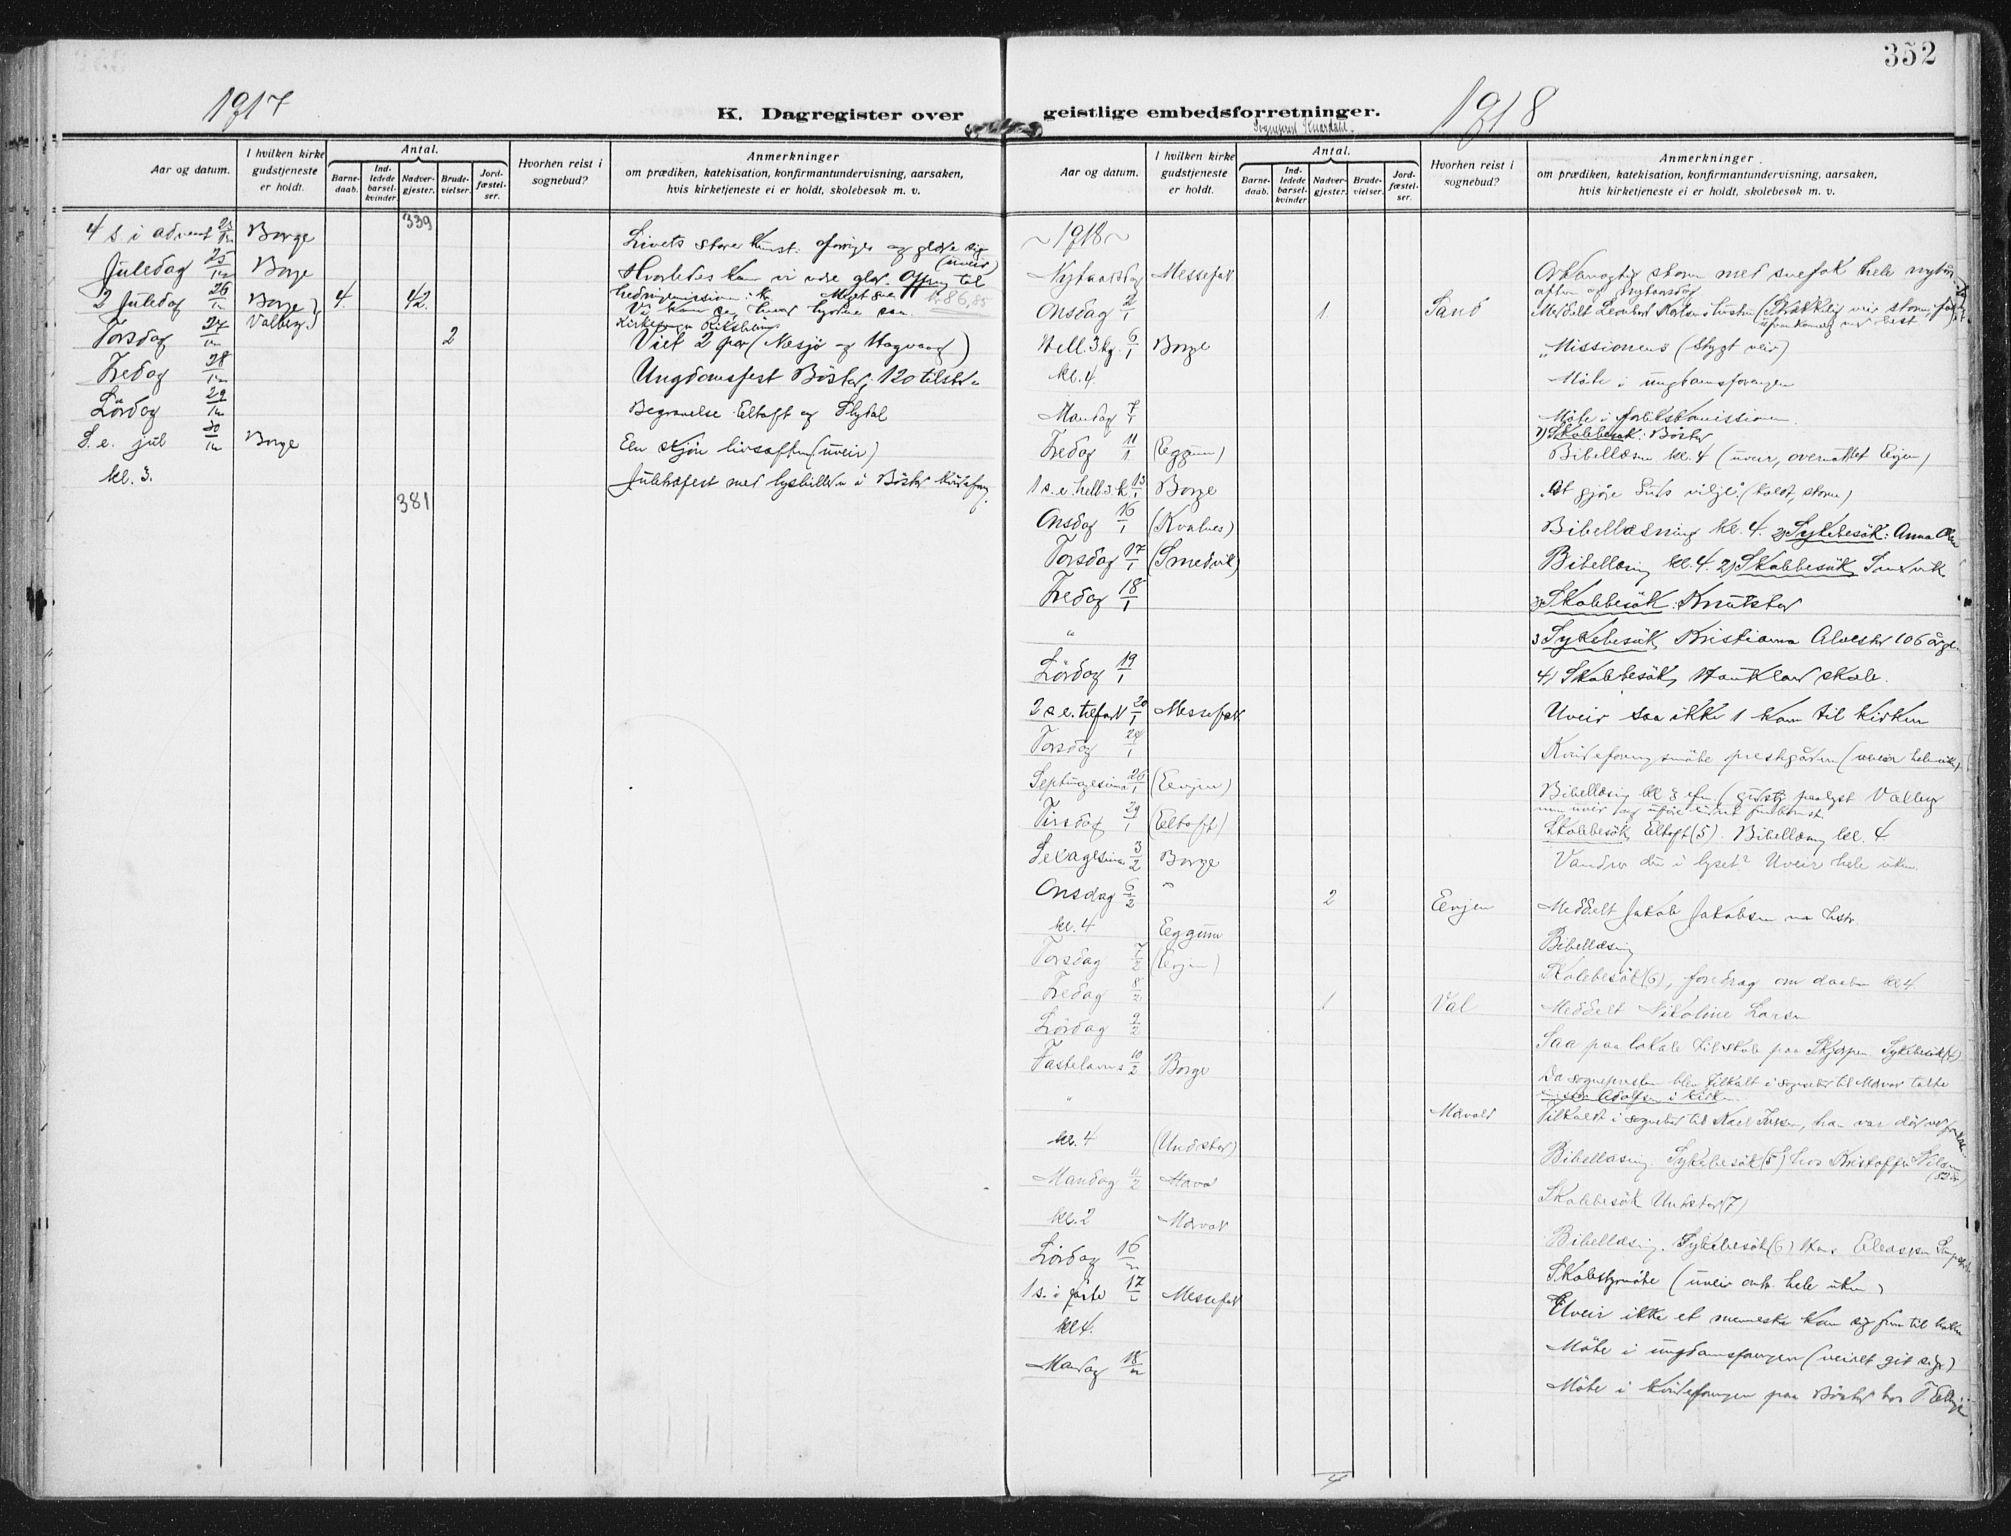 SAT, Ministerialprotokoller, klokkerbøker og fødselsregistre - Nordland, 880/L1135: Ministerialbok nr. 880A09, 1908-1919, s. 352